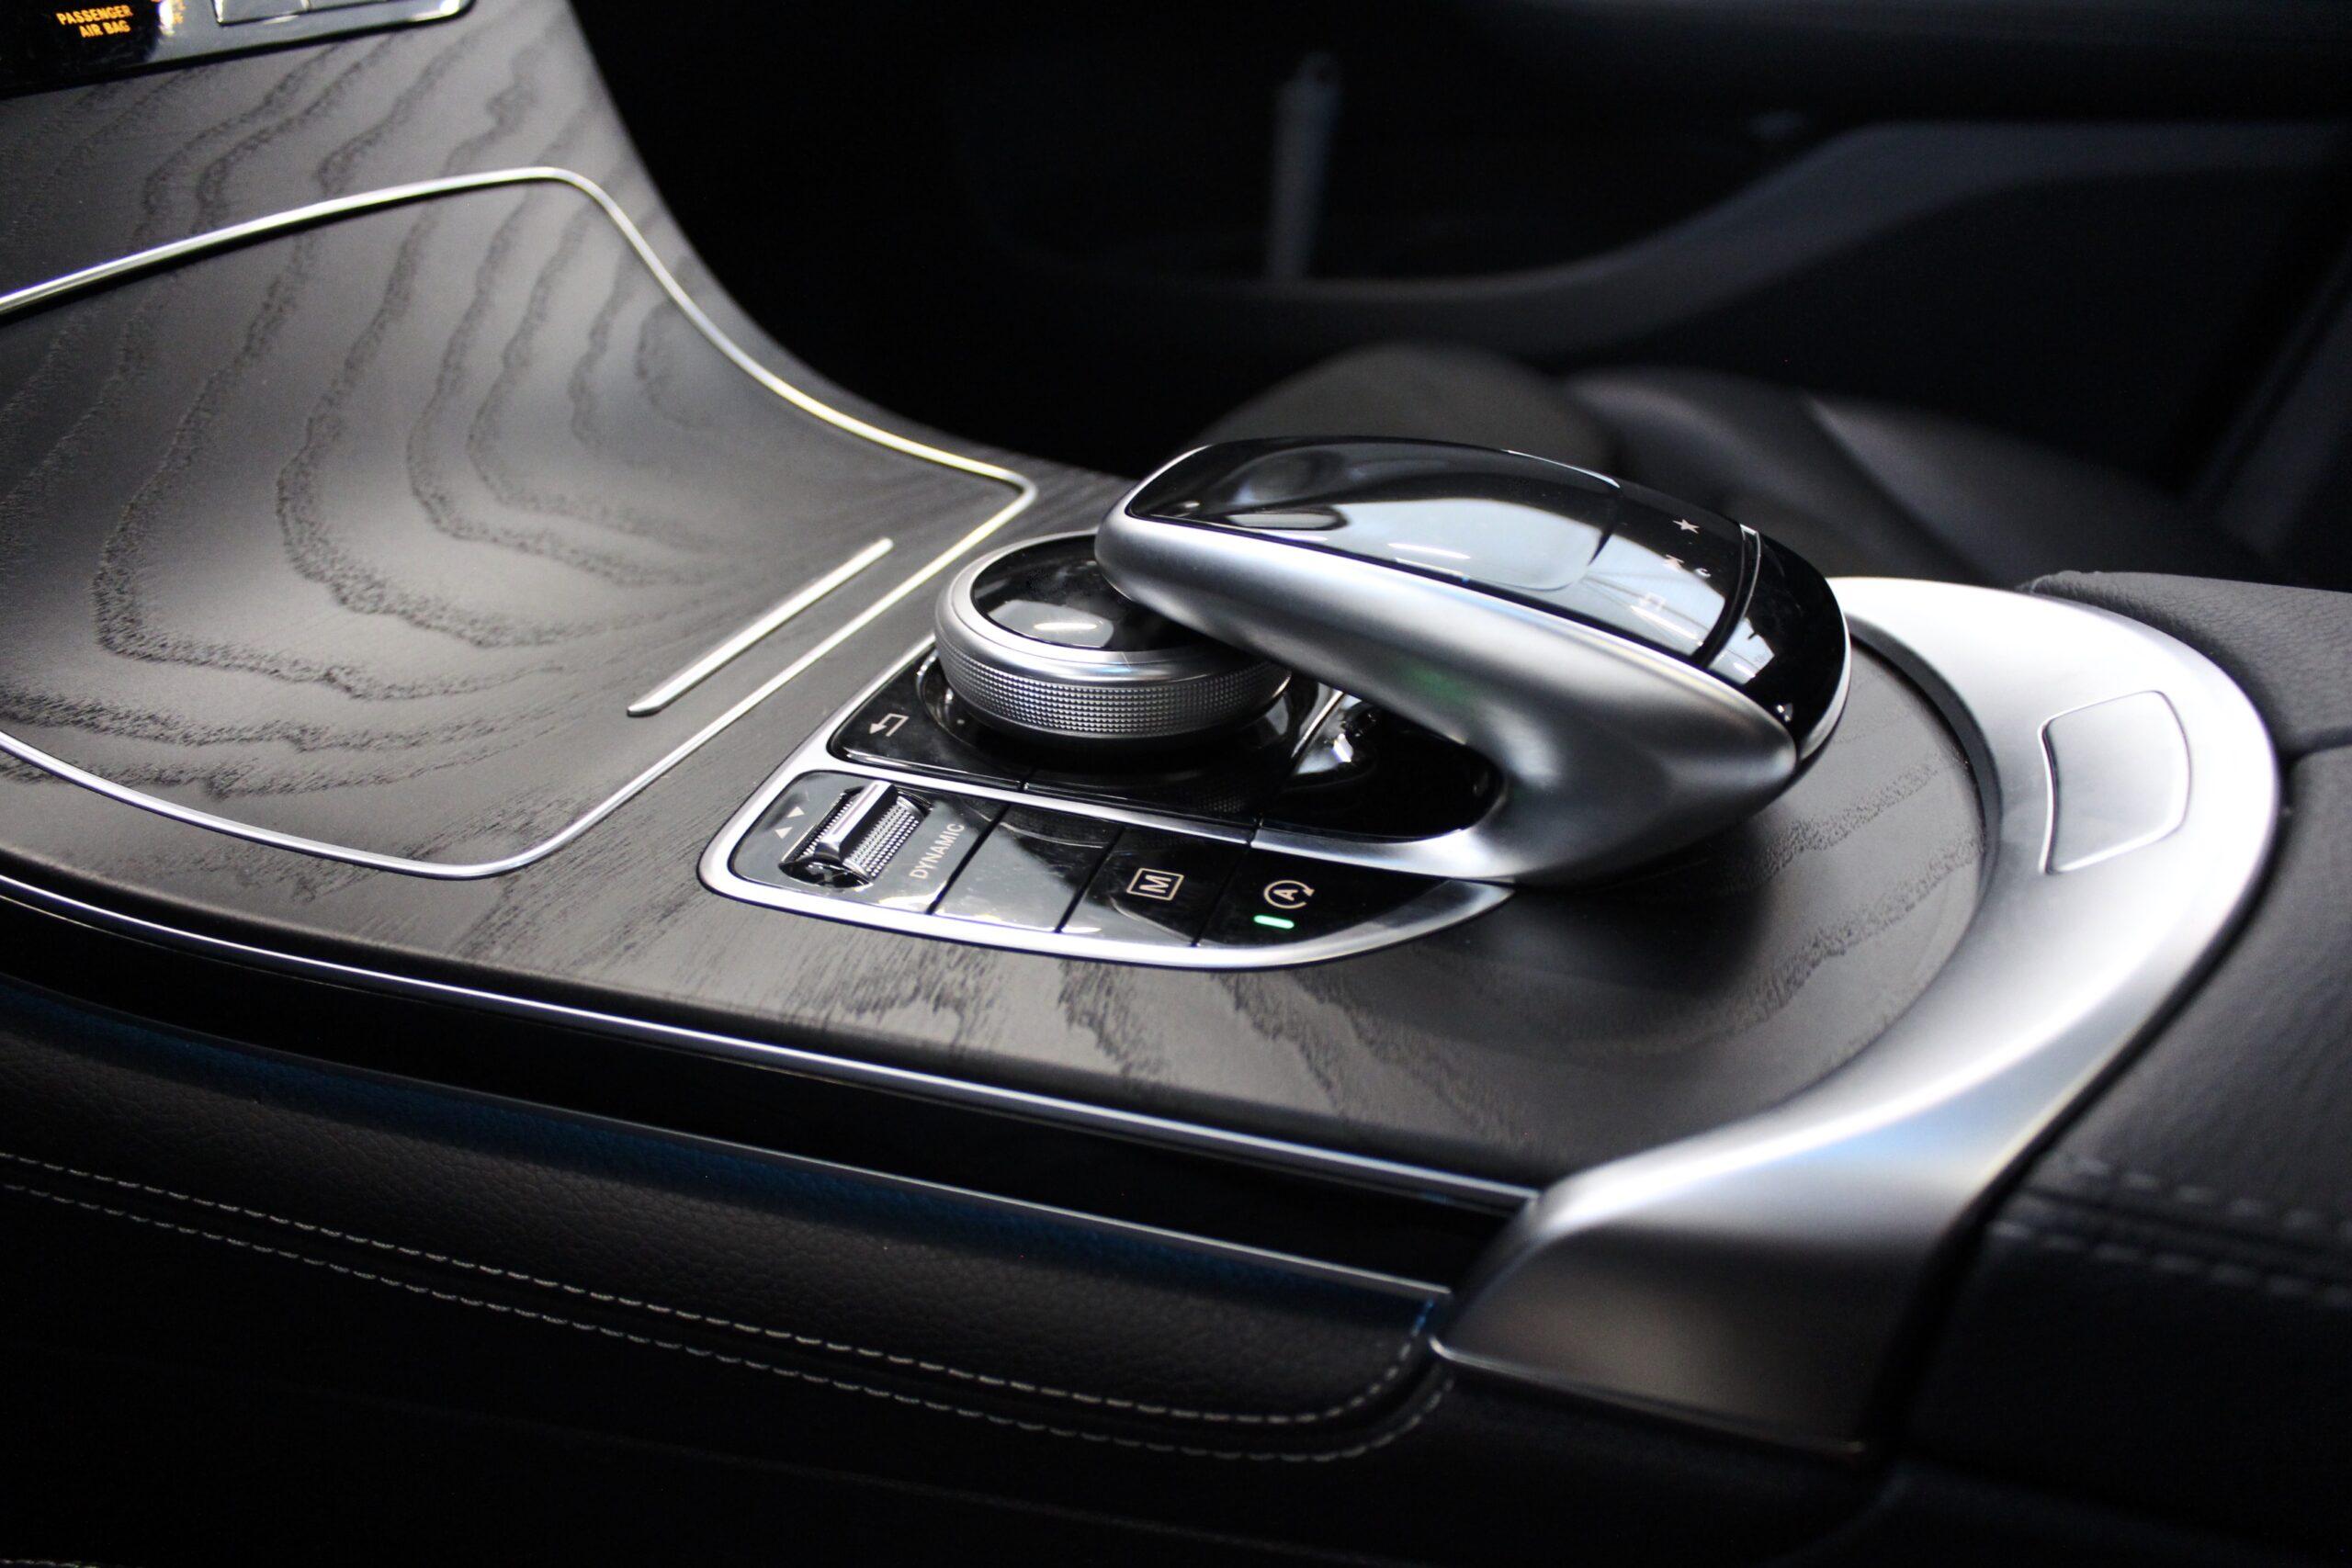 Mercedes-Benz GLC 220 d Coupé AMG 4MATIC 9G-Tronic Euro 6